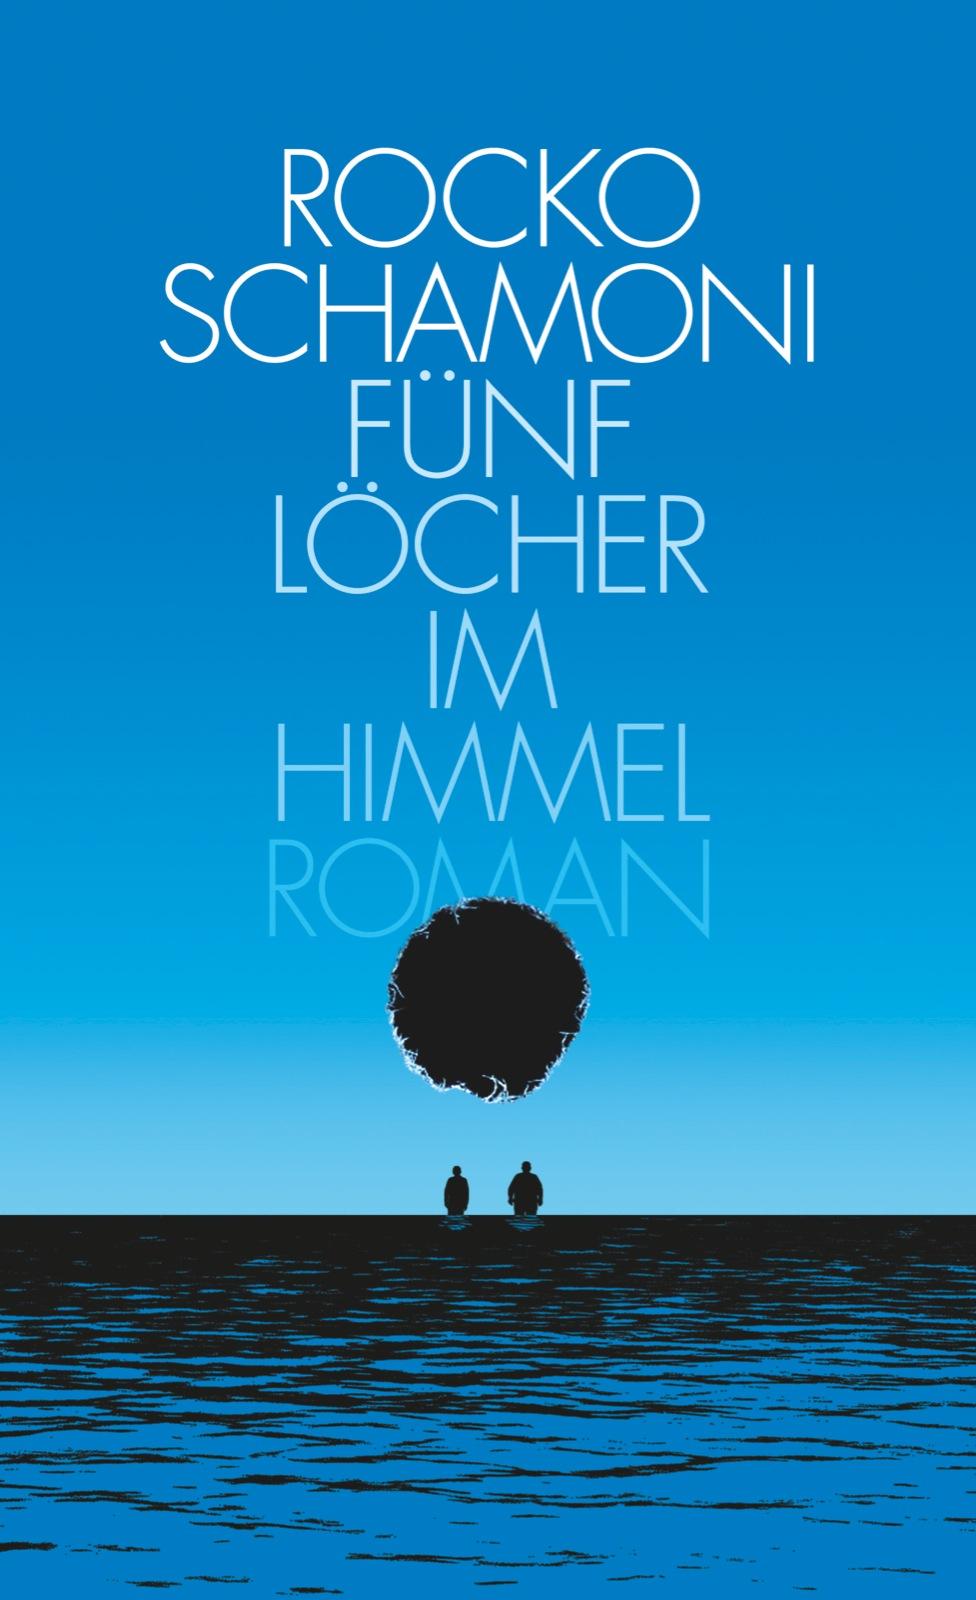 Fünf Löcher im Himmel - Rocko Schamoni [Gebundene Ausgabe]